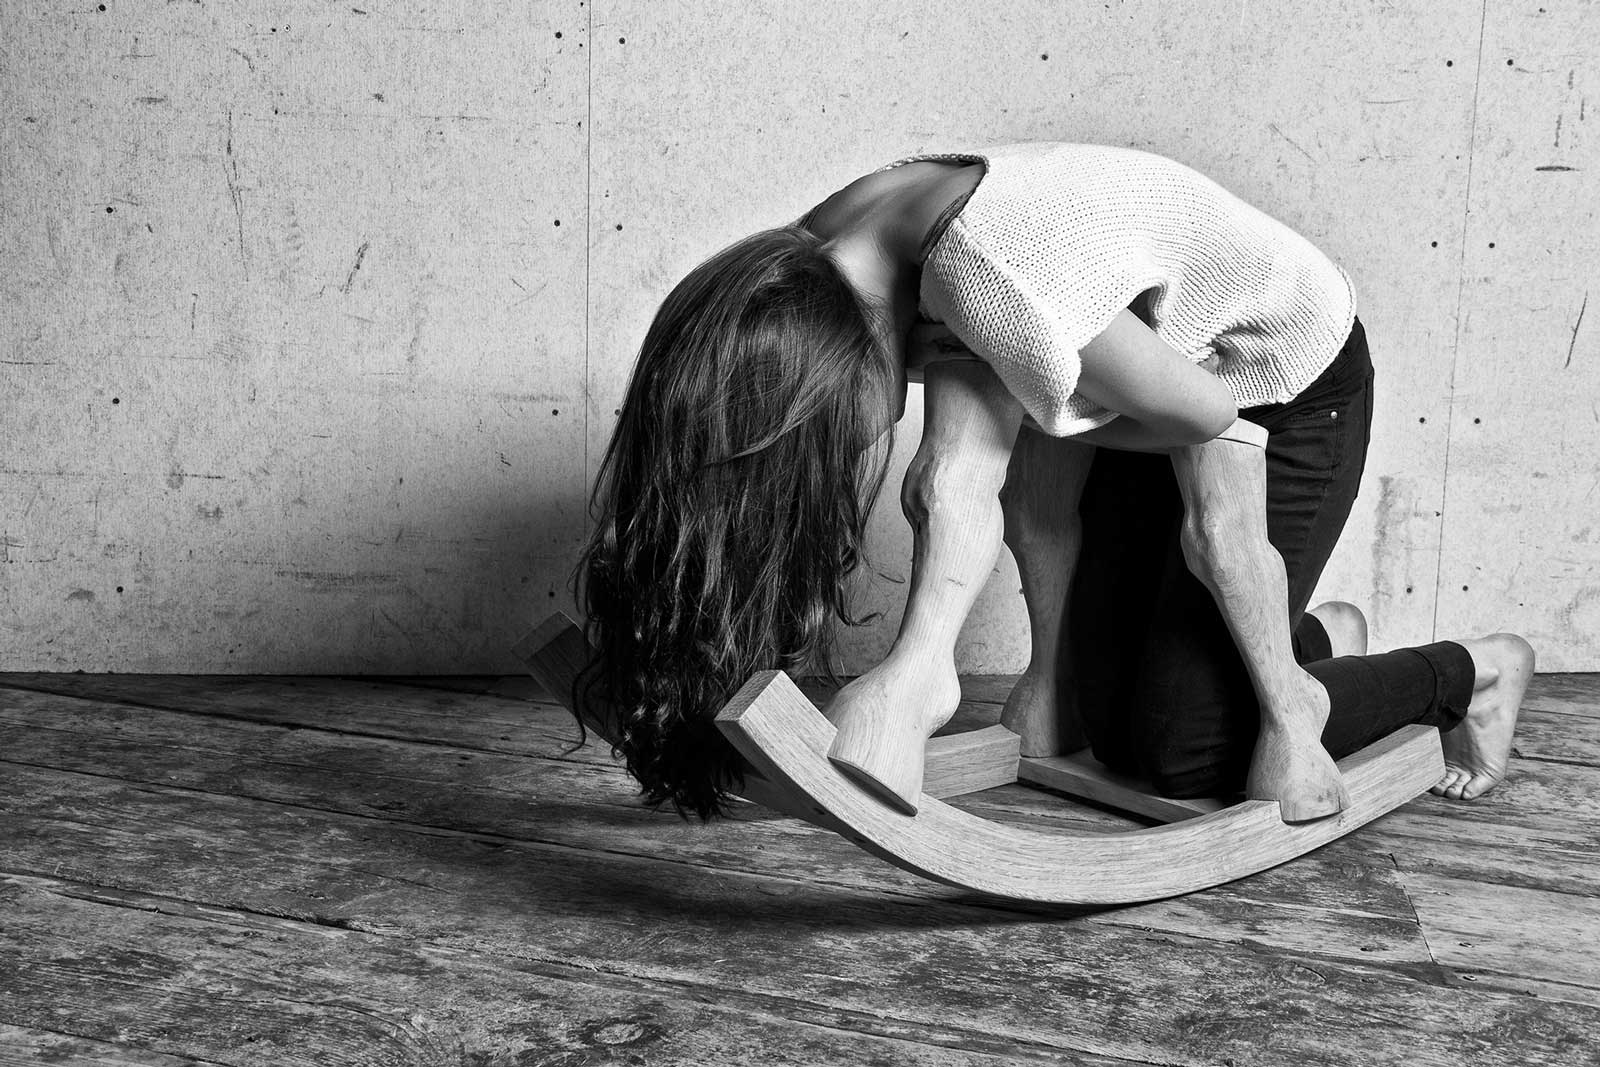 Luka-Jana-Berchtold_Untitled-02-c-Melanie-Schneider